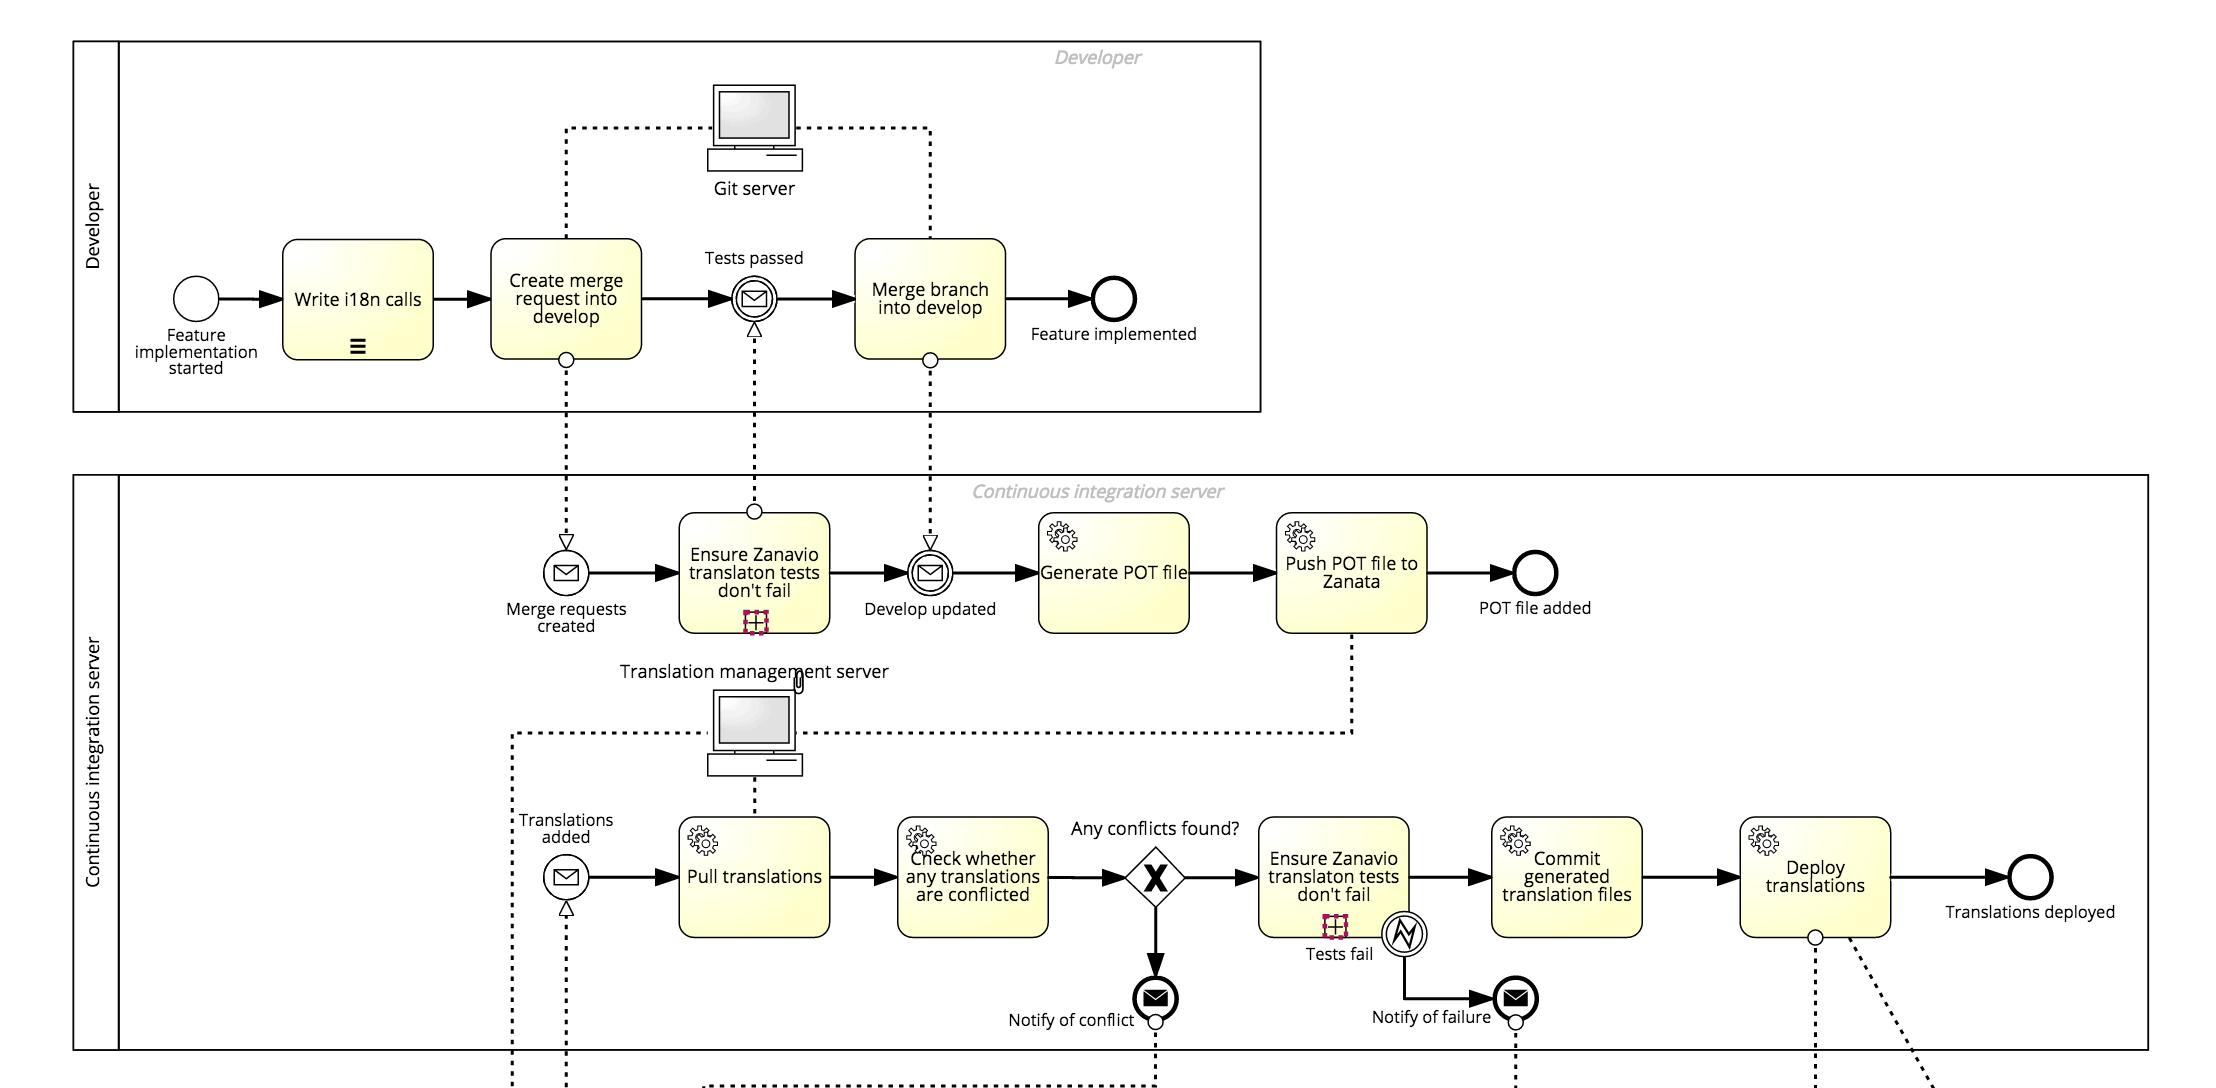 Enterprise Architecture Modeling For Bpm Professionals